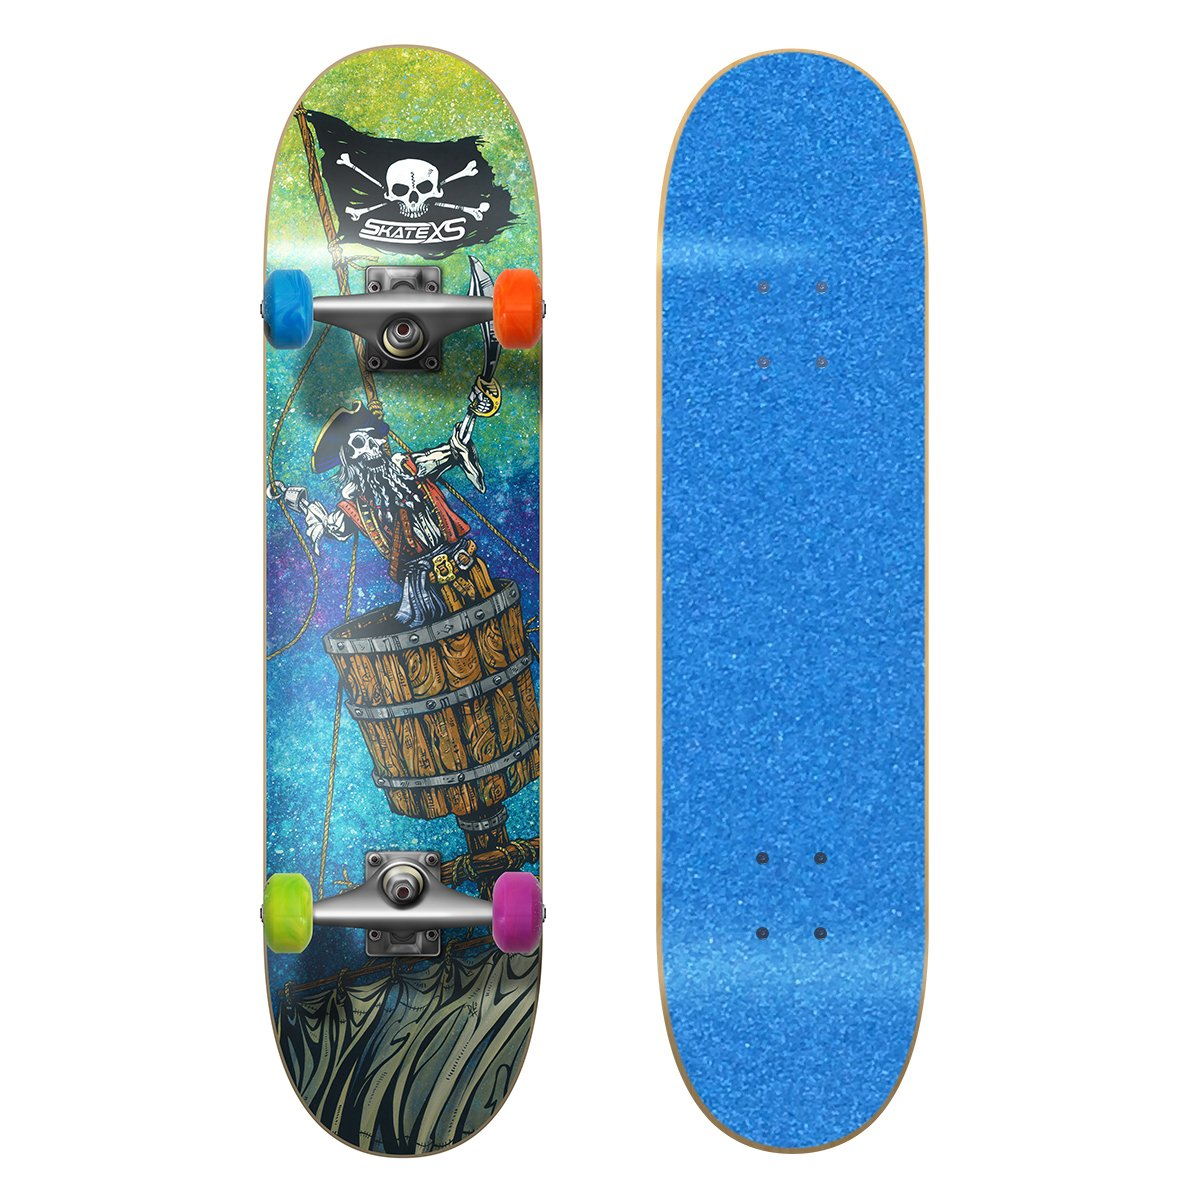 SkateXS ビギナー 8-10) 海賊 ストリート スケートボード x 7.25 x Tape 29 (Ages 8-10) Blue Grip Tape/ Multi-Color Wheels B01N7EBXWH, 東津軽郡:c8d696c8 --- ero-shop-kupidon.ru